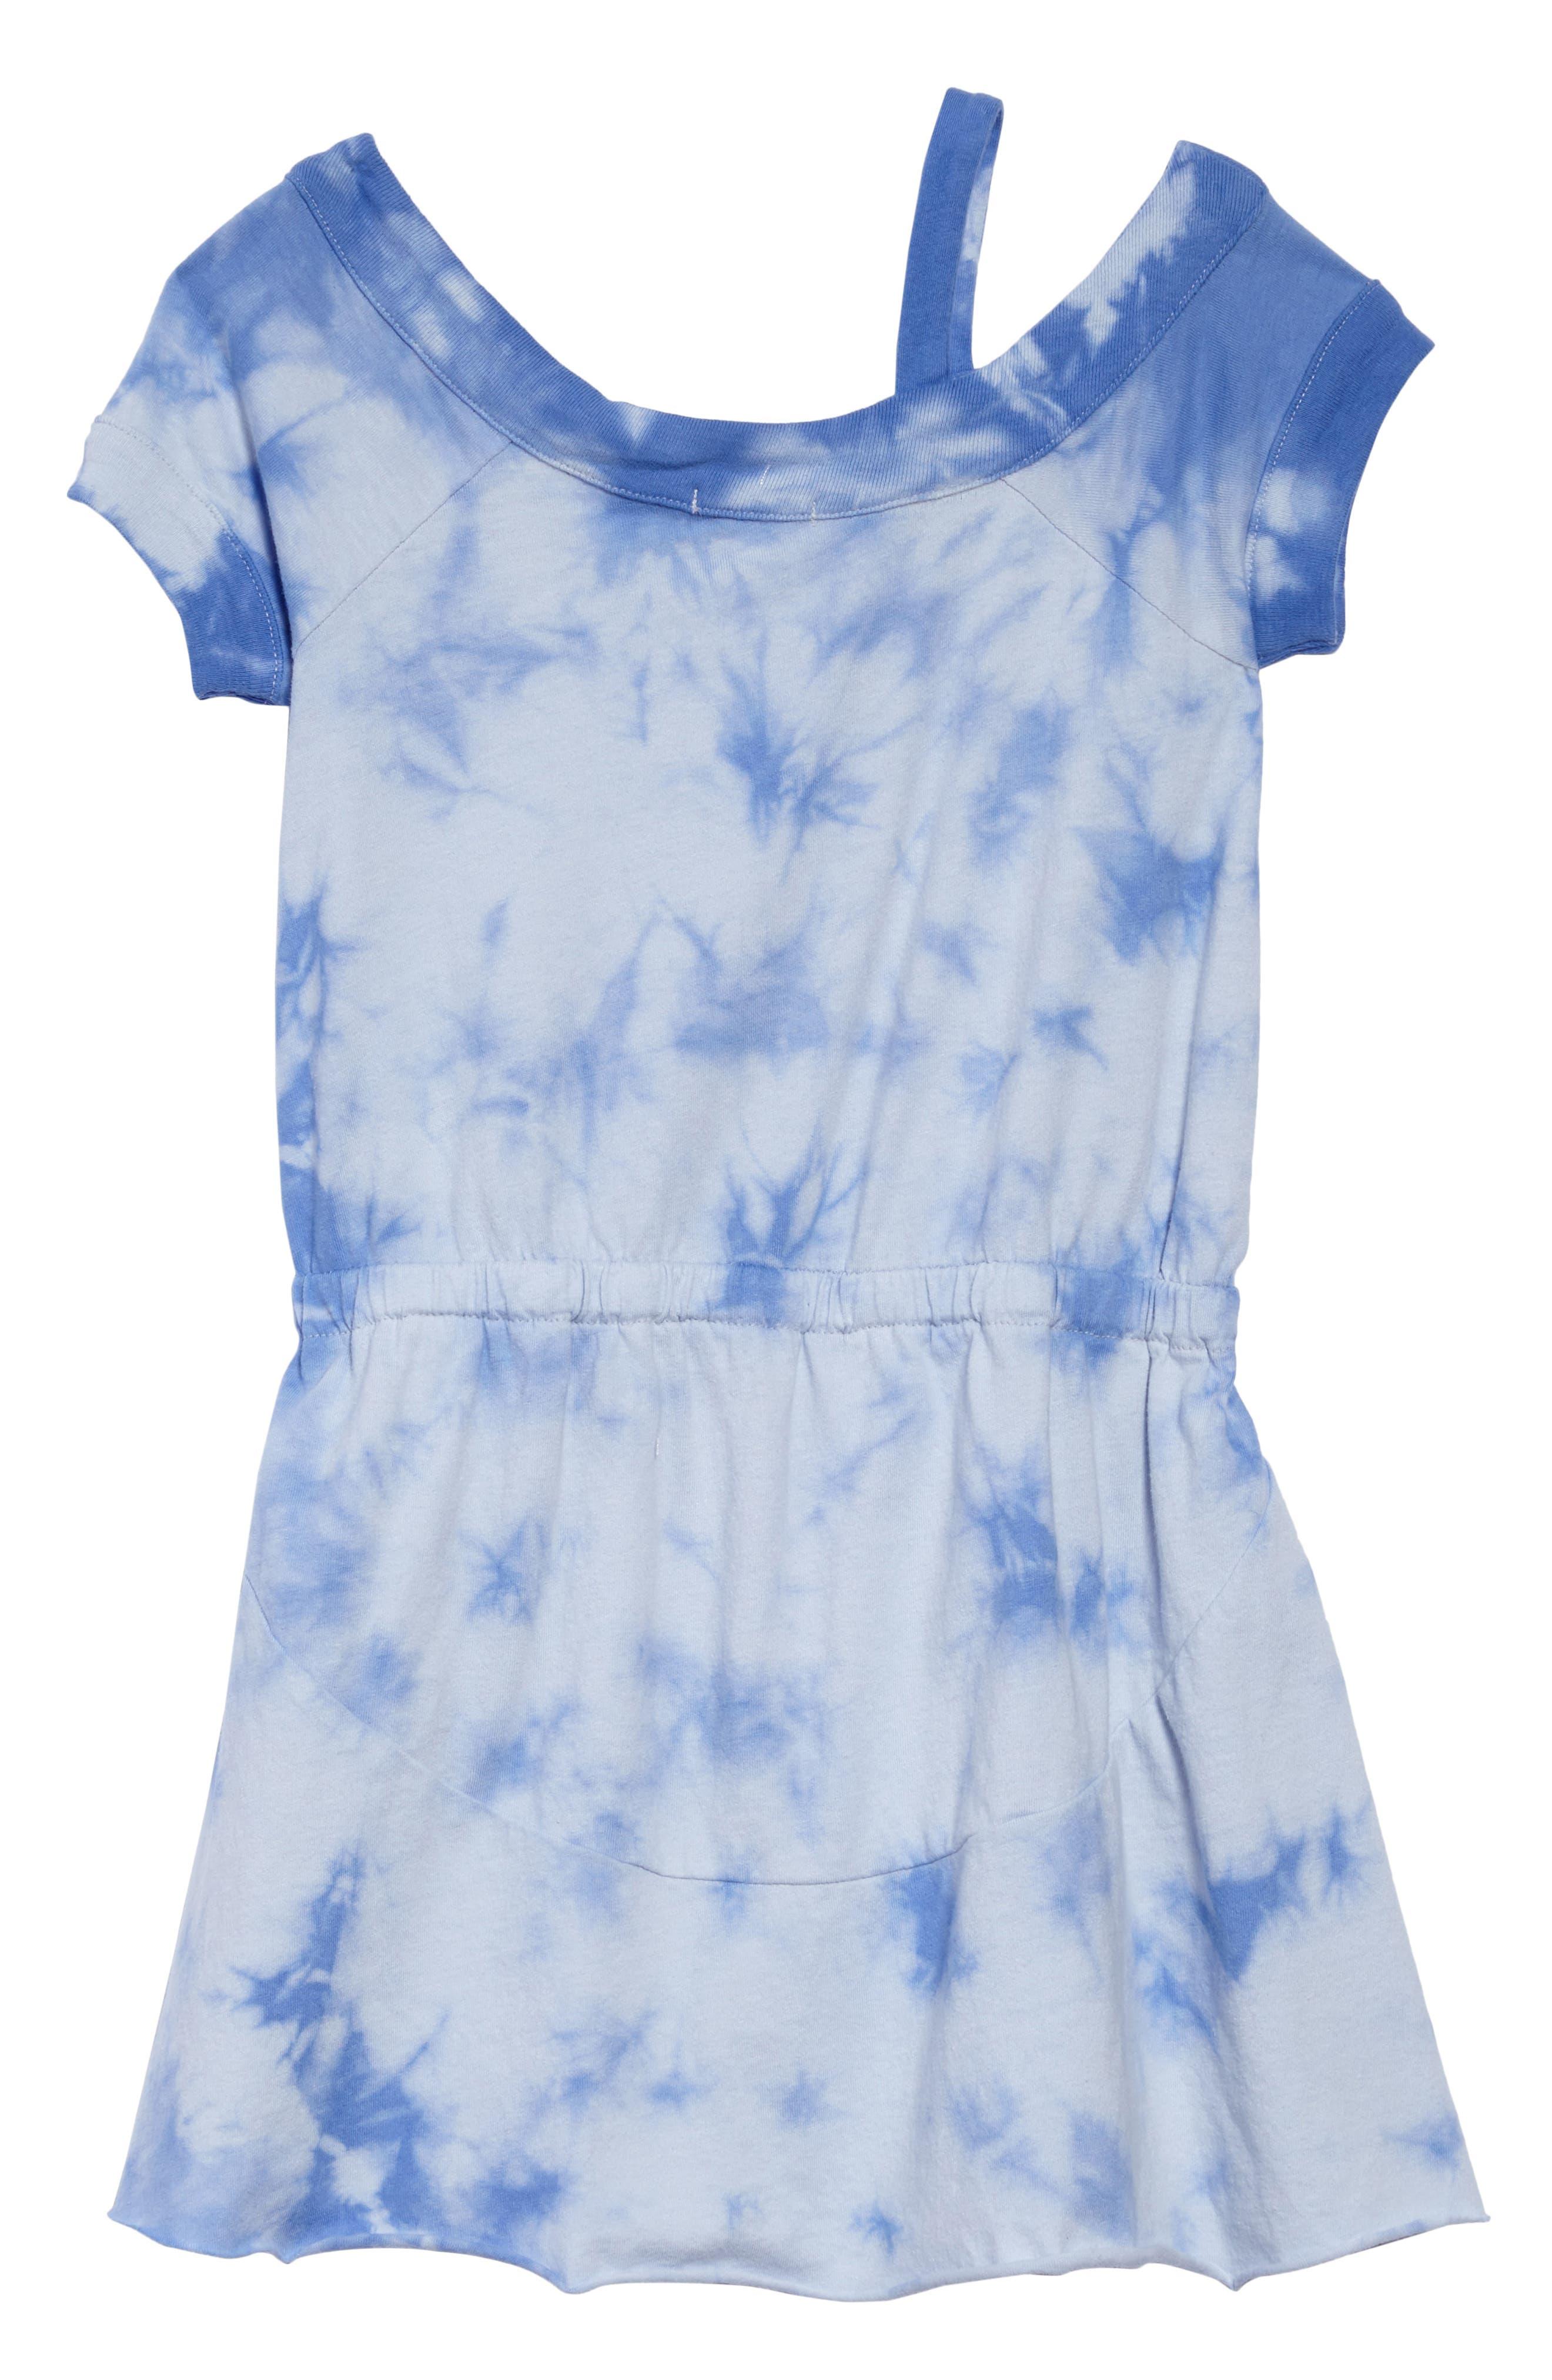 One-Shoulder Tie Dye Dress,                             Alternate thumbnail 2, color,                             Hydrangea